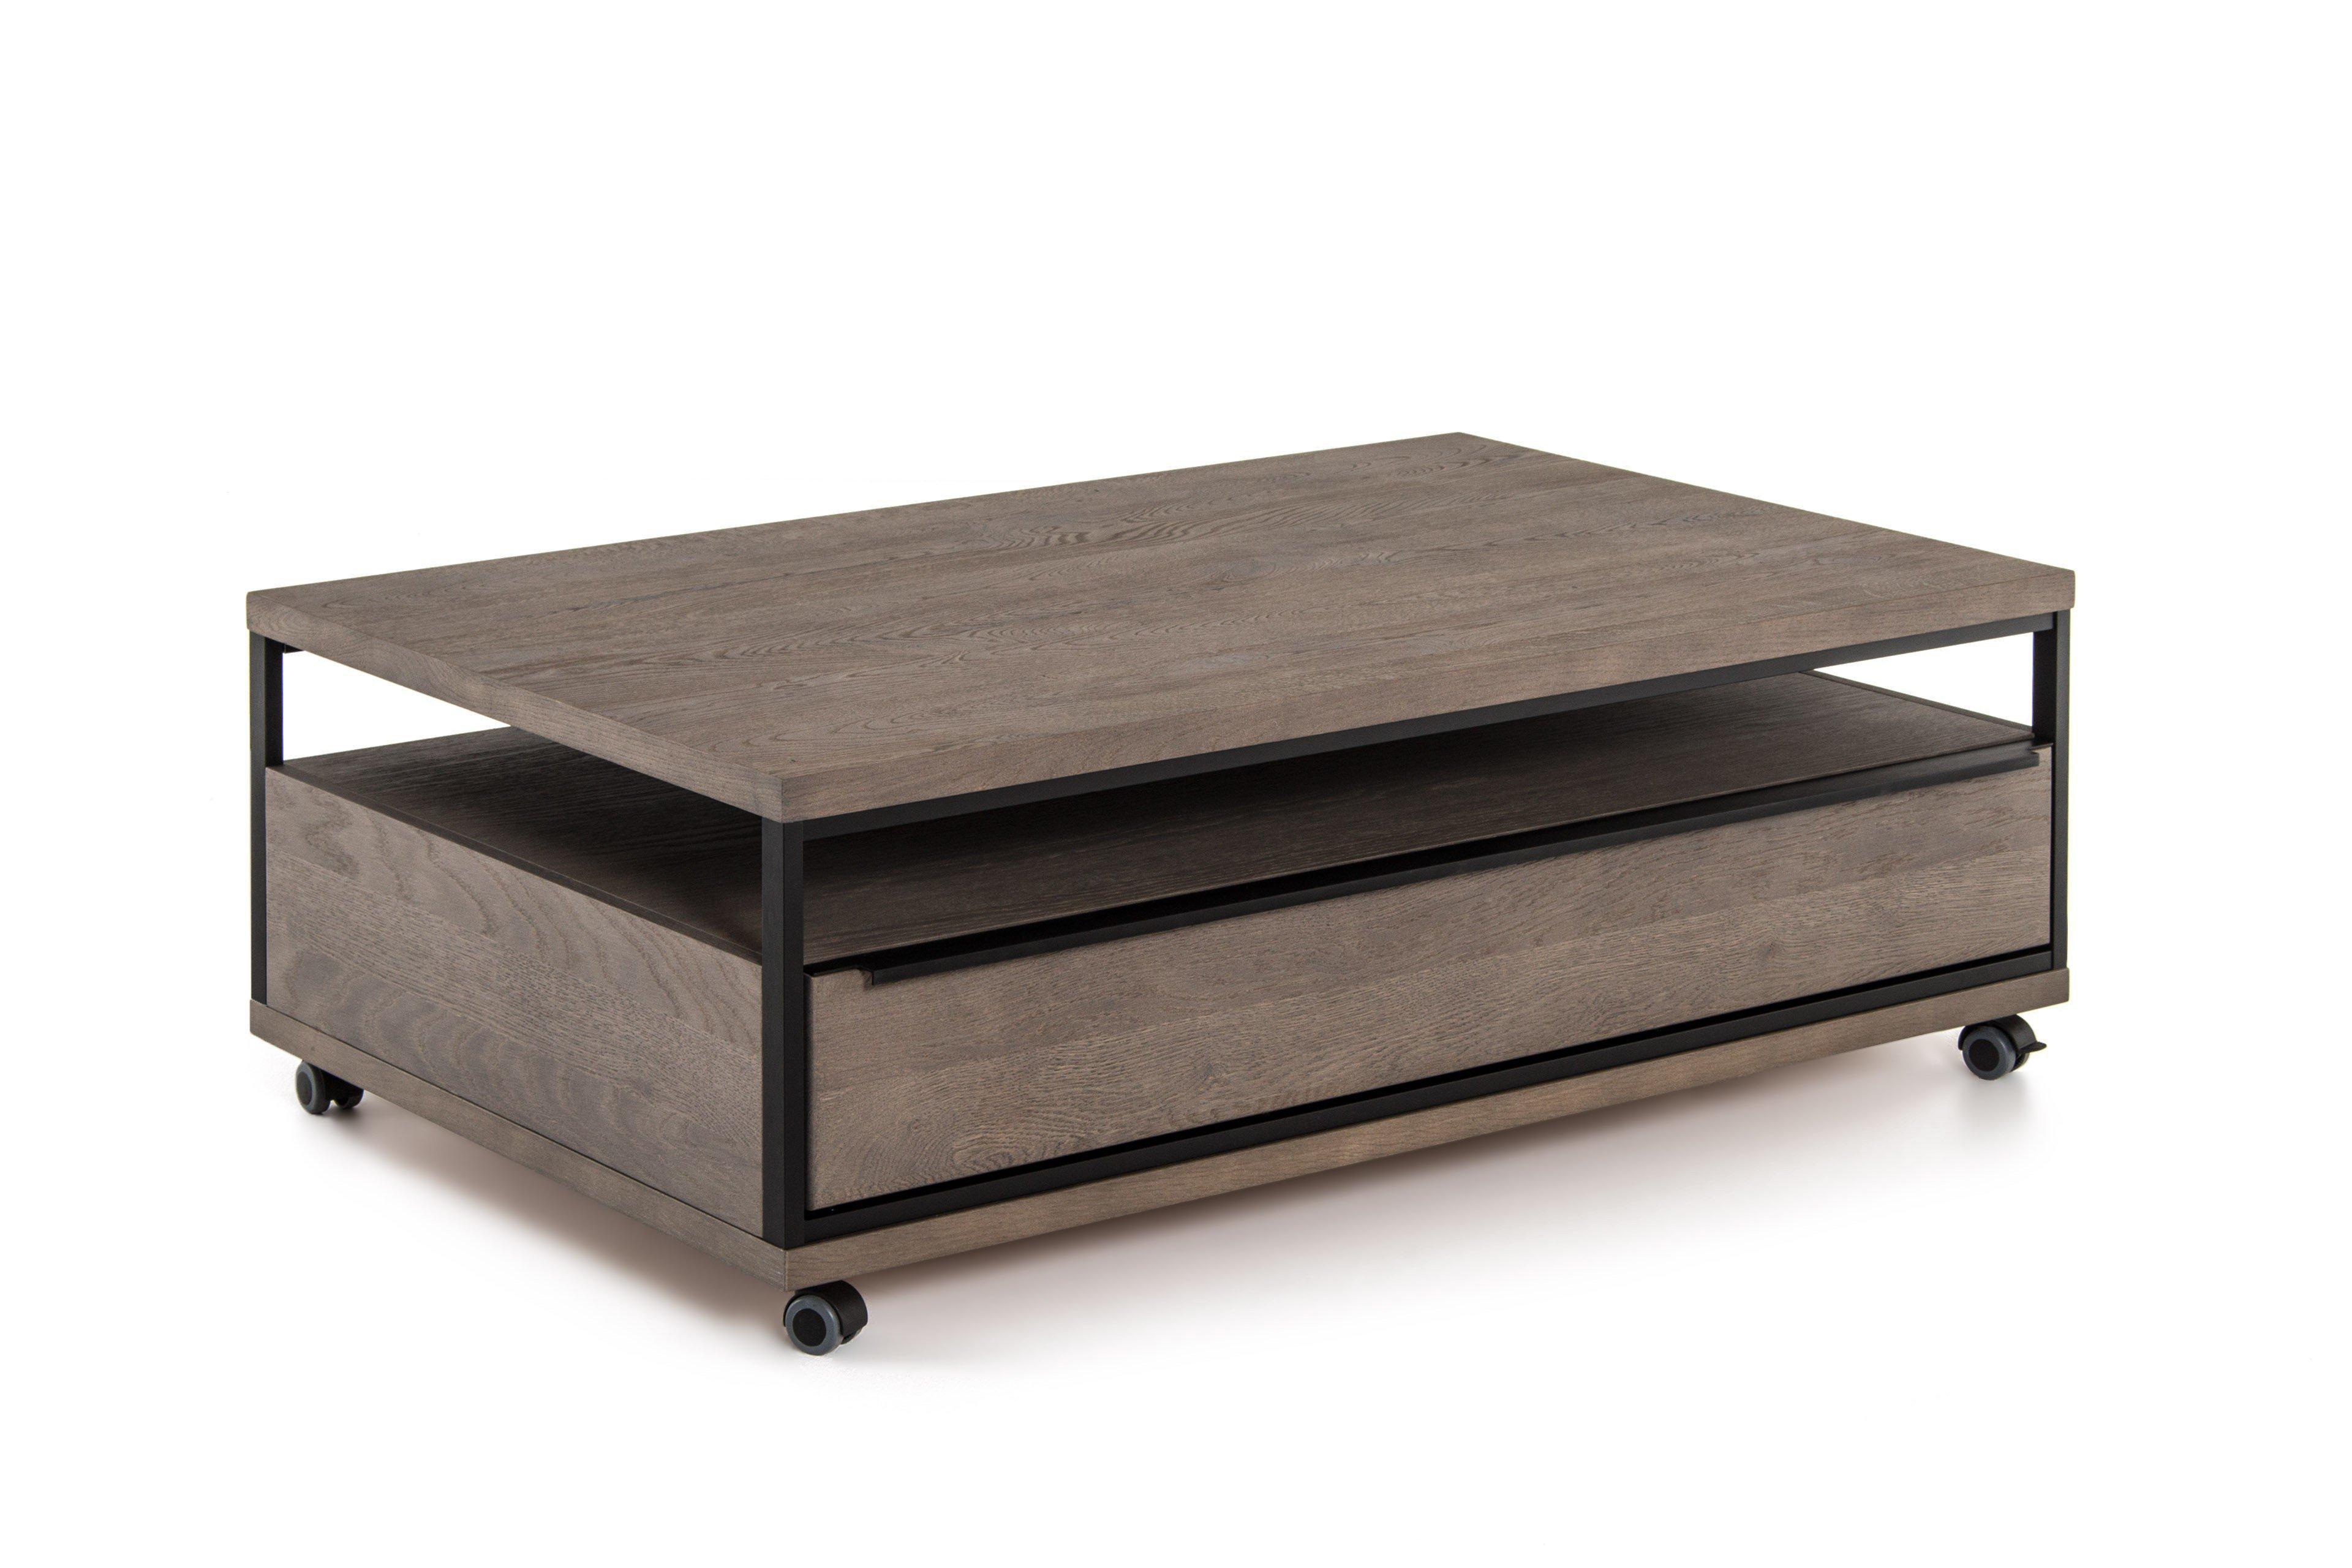 mca couchtisch avignon avi15t65 in asteiche stone grau. Black Bedroom Furniture Sets. Home Design Ideas